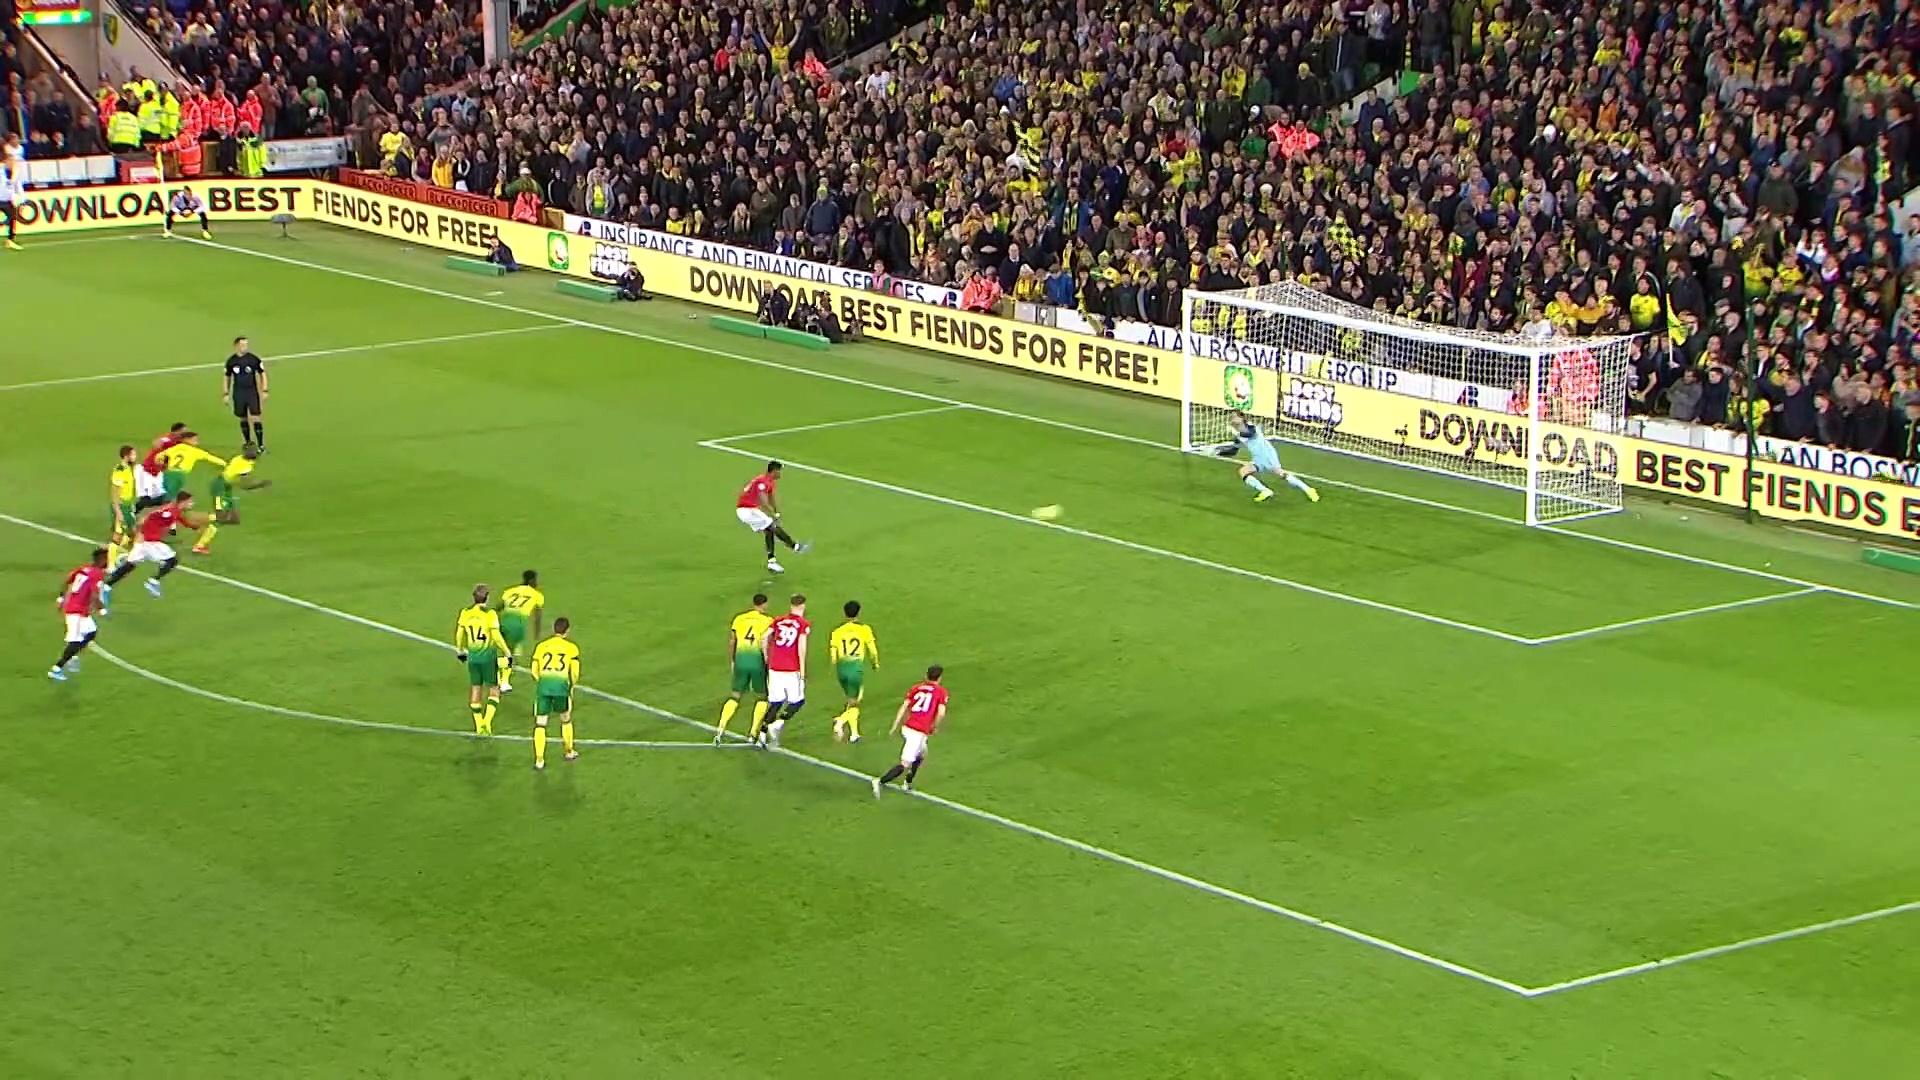 10. Hafta / Norwich City - Manchester United: 1-3 (Özet)